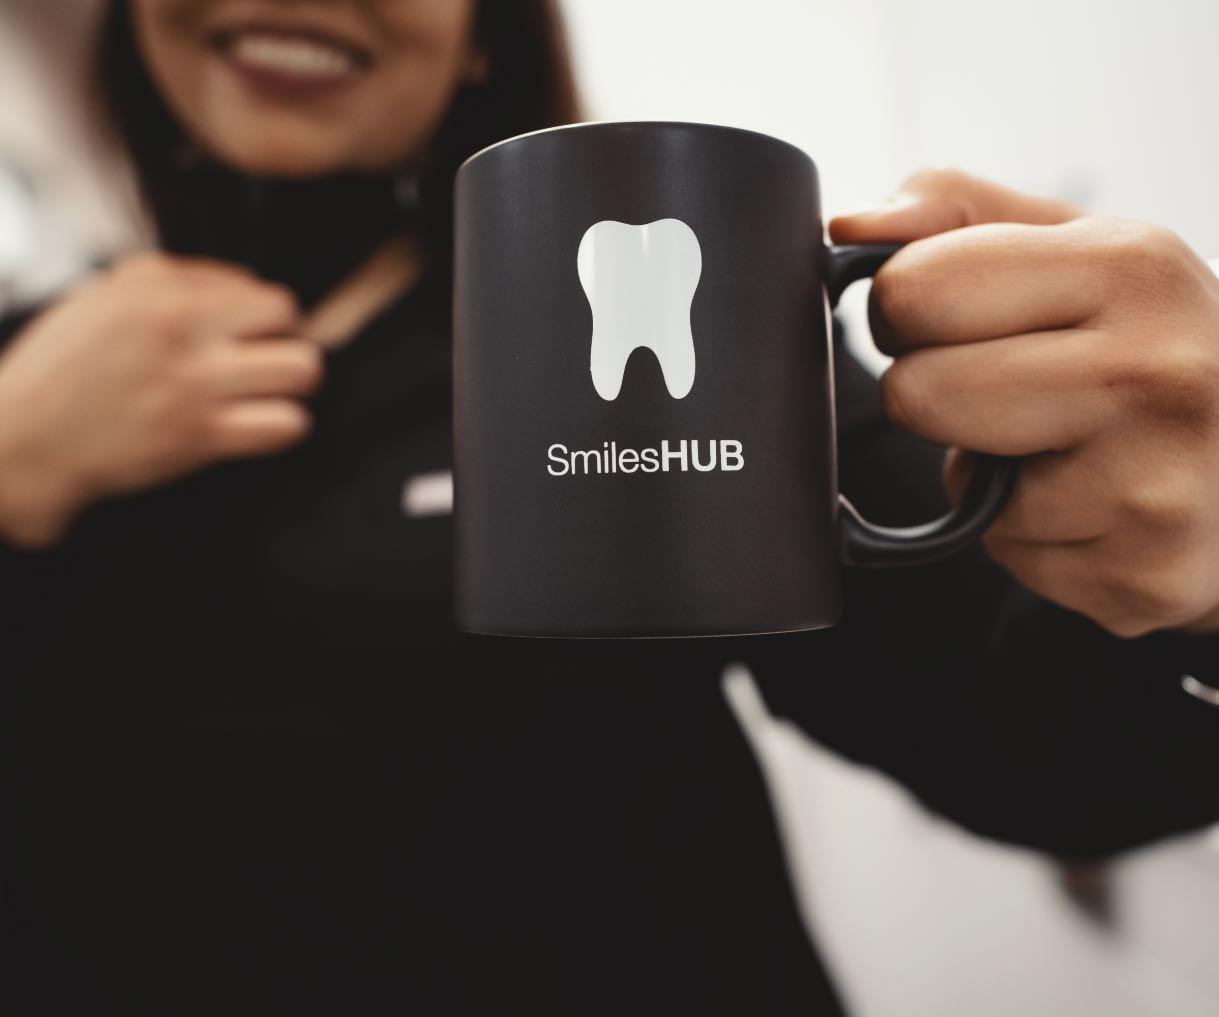 Photo of a SmilesHUB team member holding a SmilesHUB branded mug